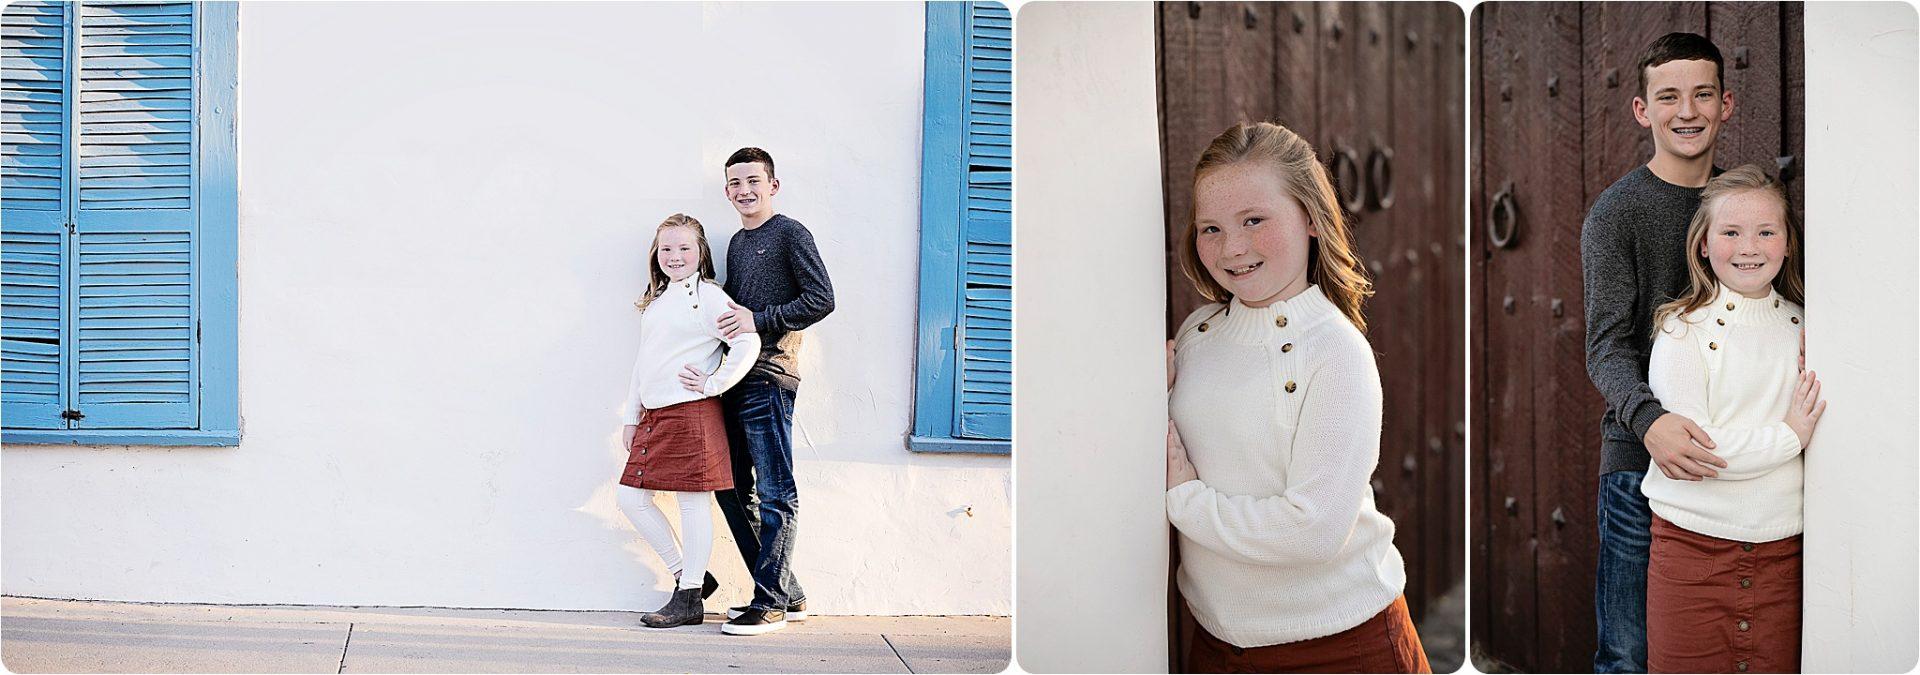 TUcson Child Photographer